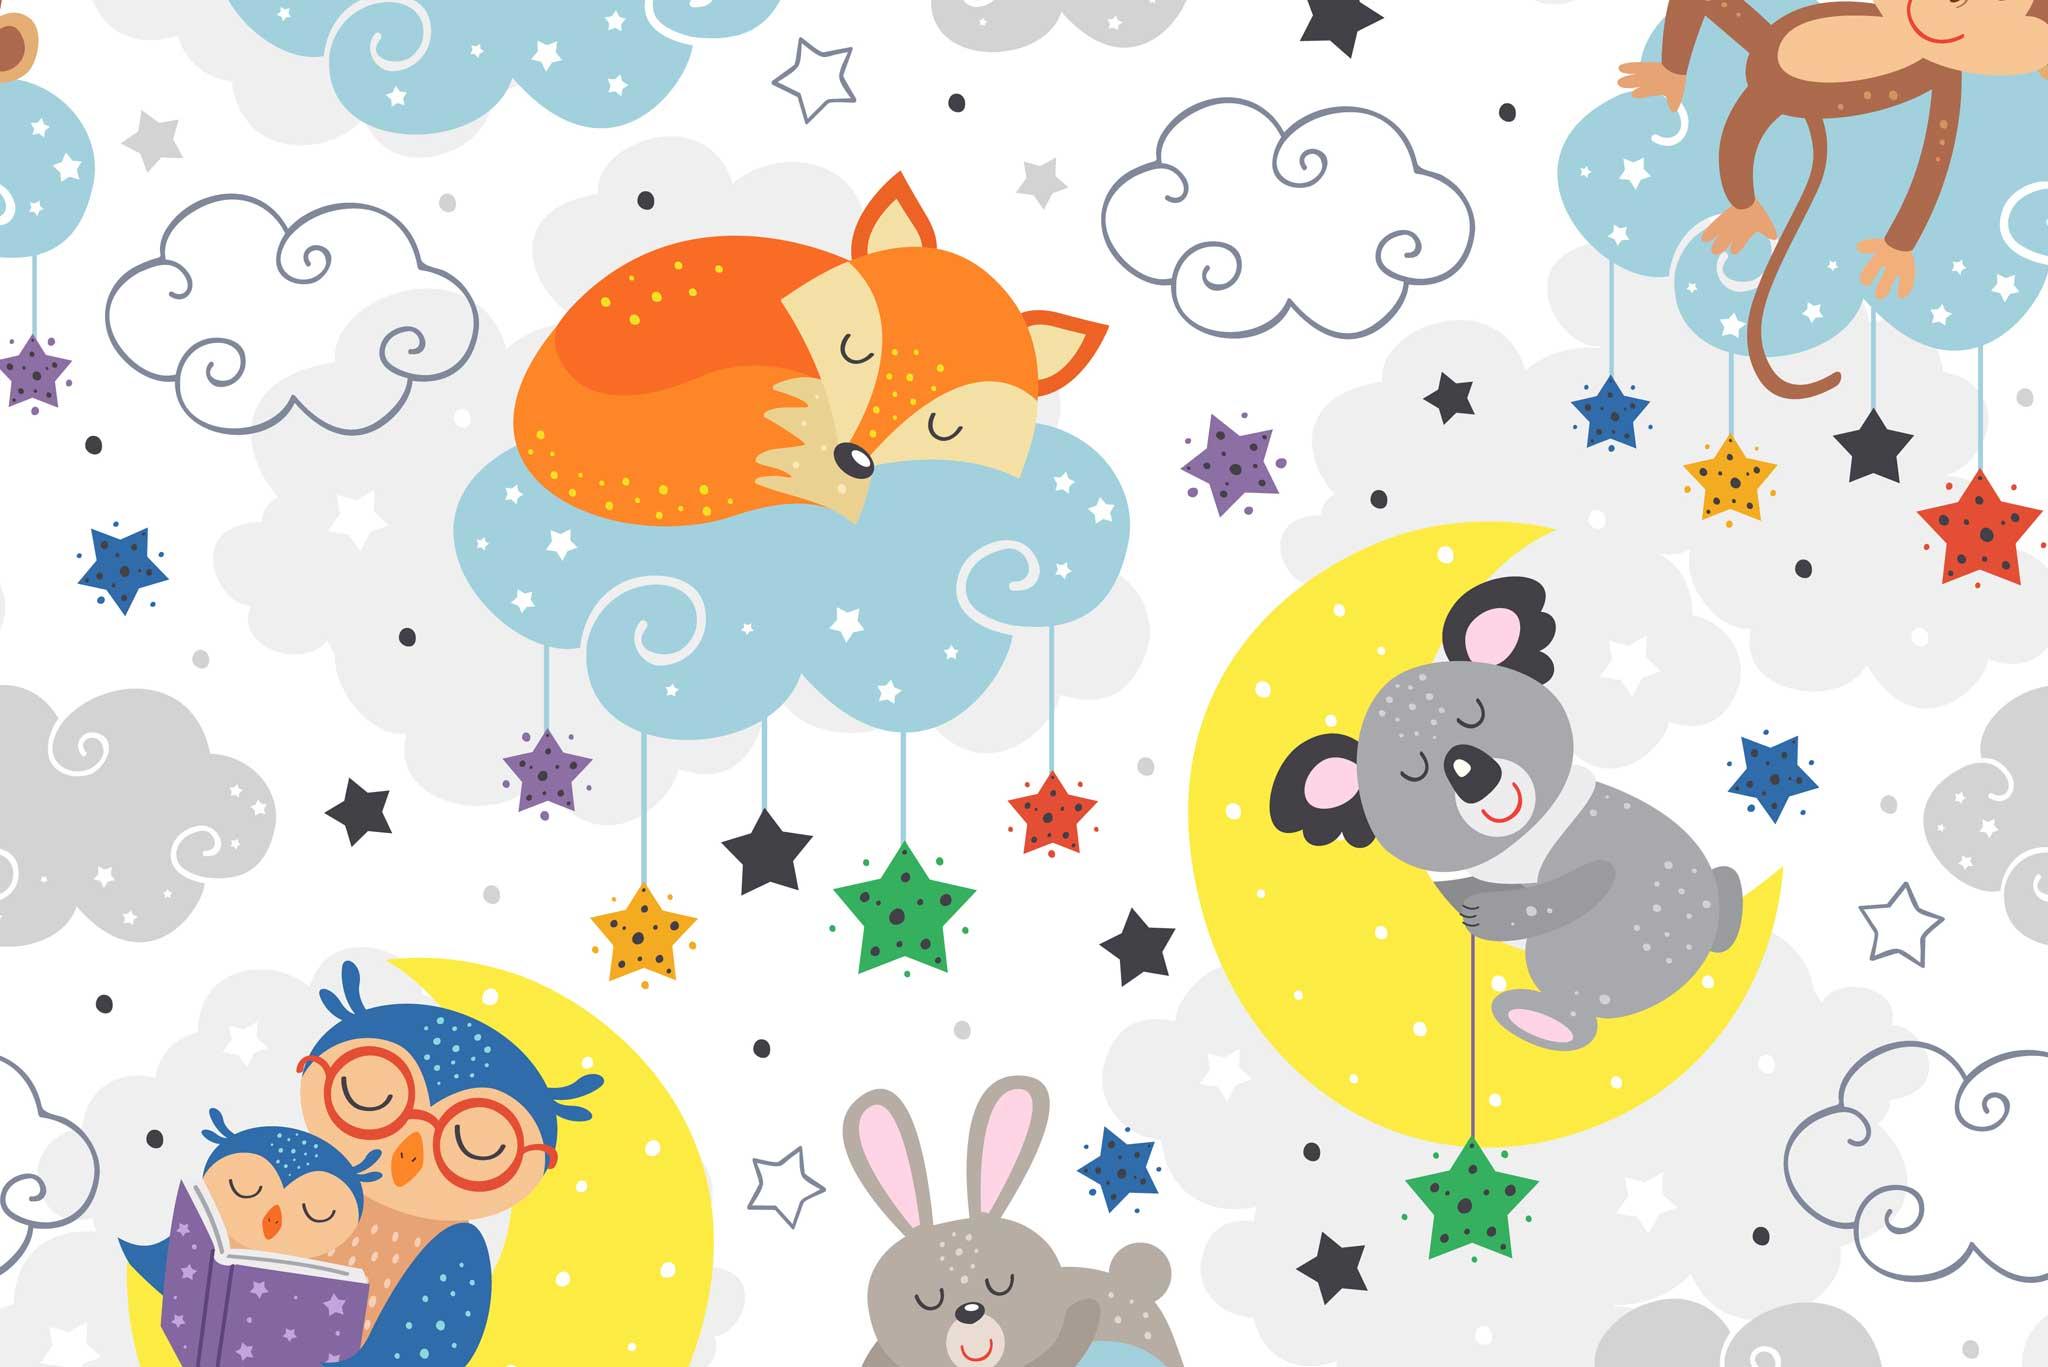 tapet-fototapet-design-decor-mural-customizabil-comanda-personalizat-bucuresti-daring-prints-motiv-model-copii-desen-animale-somn-dormind-koala-vulpite-multicolor